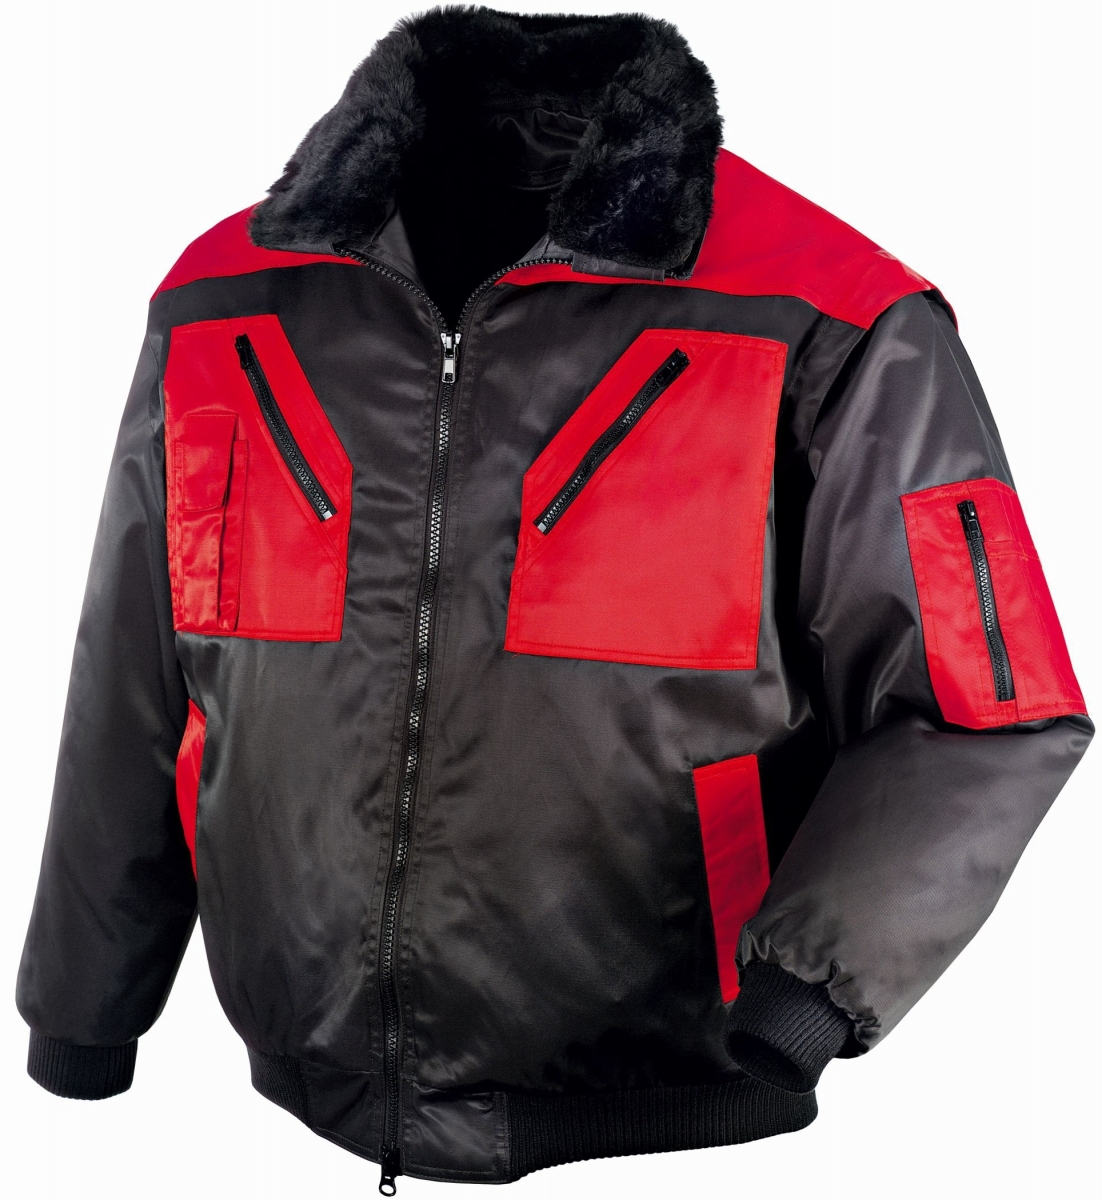 BIG-TEXXOR-Kälte-Schutz, Winter-Arbeits-Berufs-Piloten-Jacke, Oslo, schwarz/rot